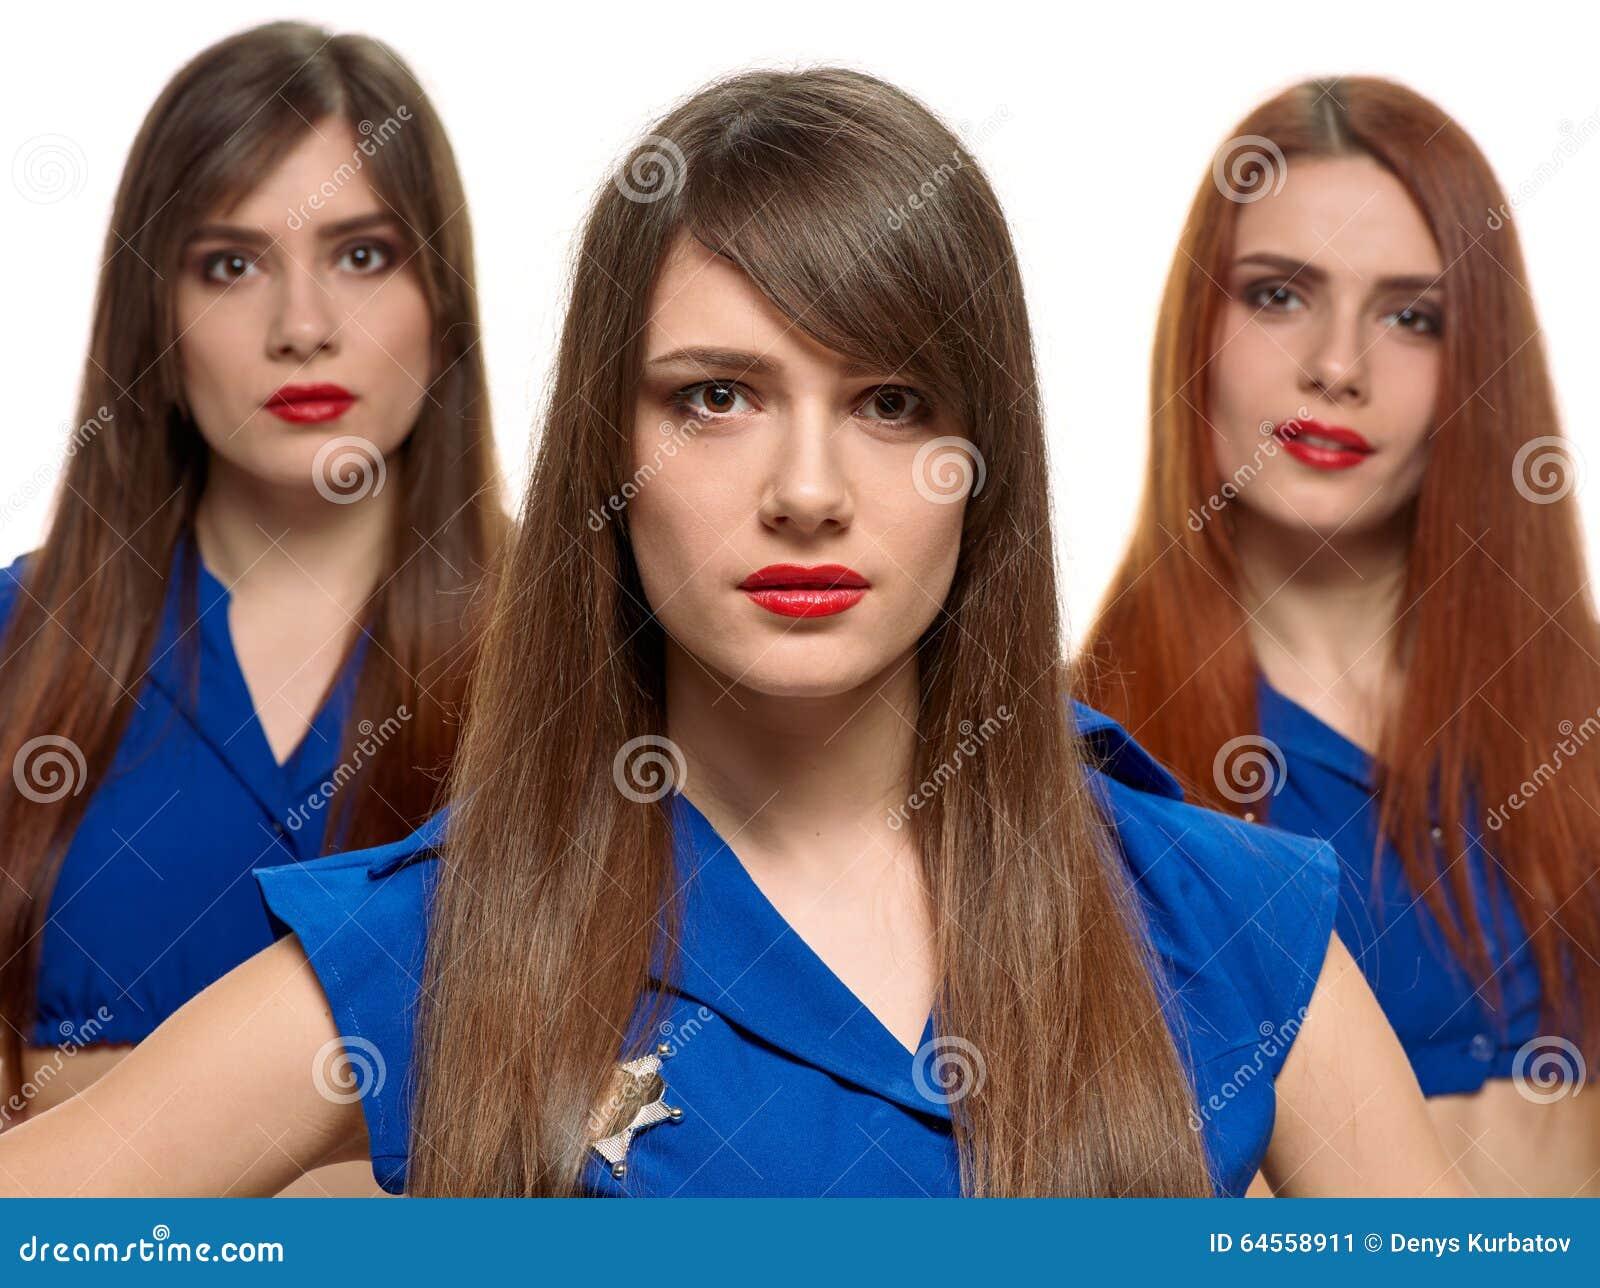 videos de chicas escorts grupo de tres